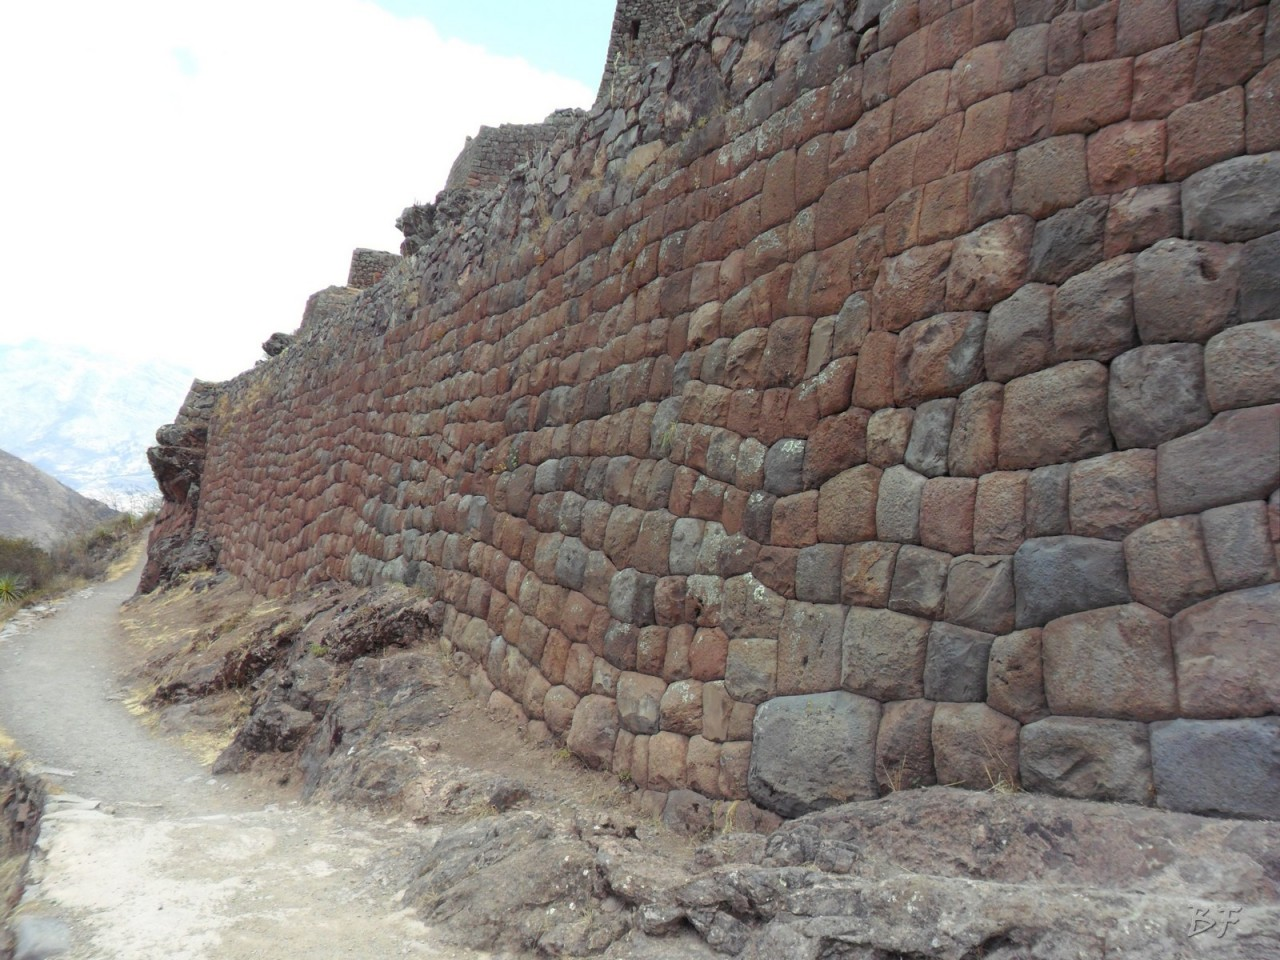 Mura-Poligonali-Megaliti-Altari-Rupestri-Pisac-Cusco-Perù-31